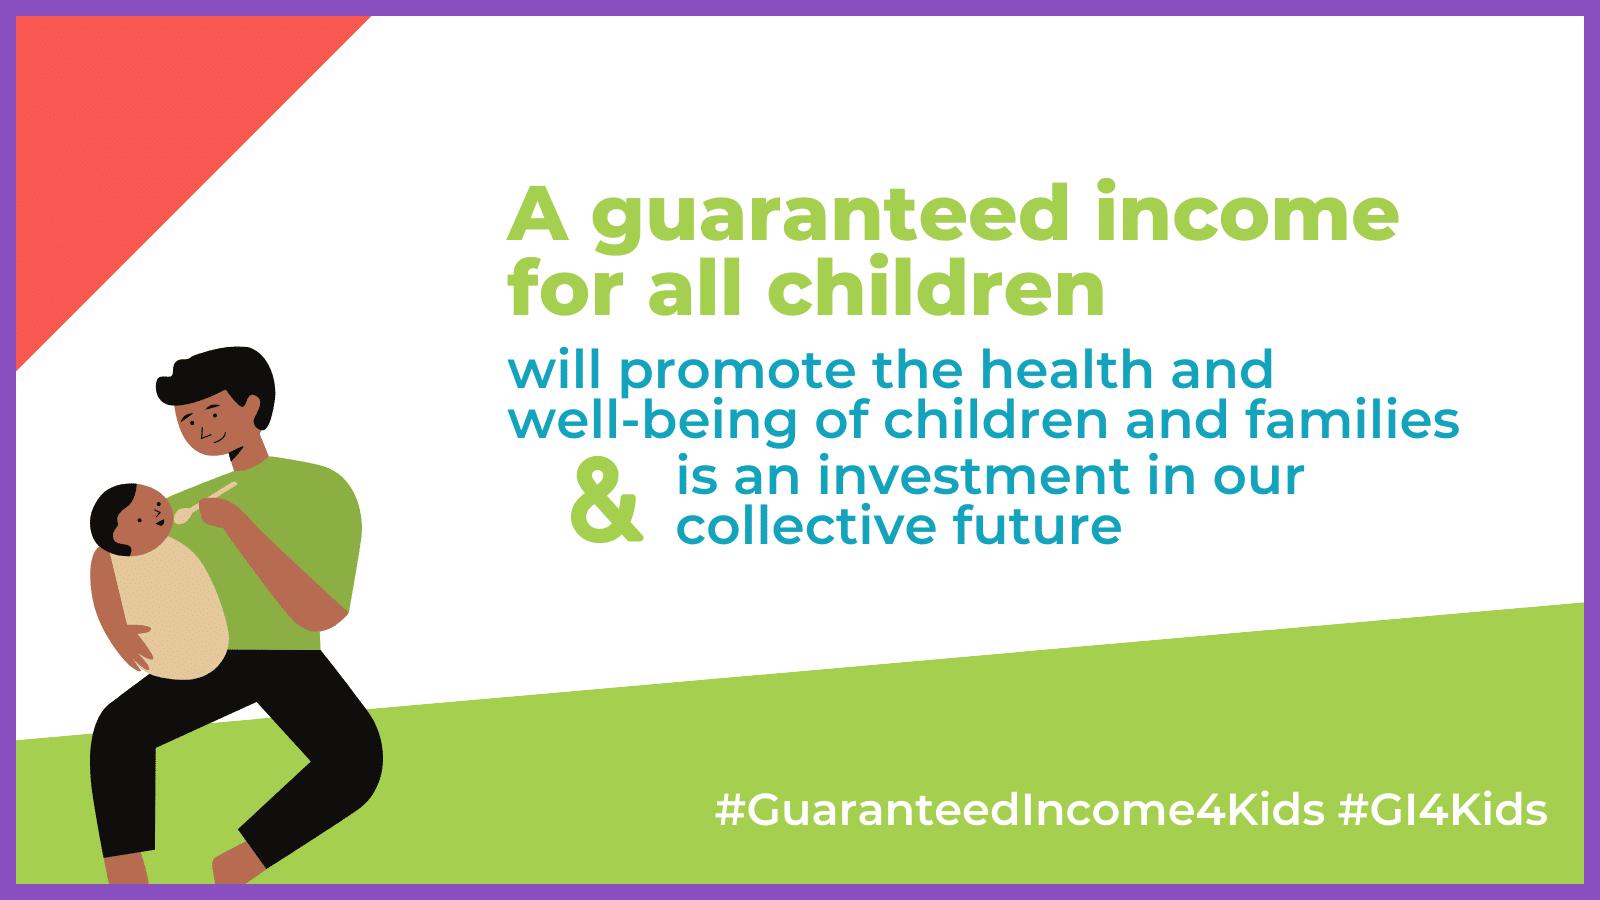 A guaranteed income for all children